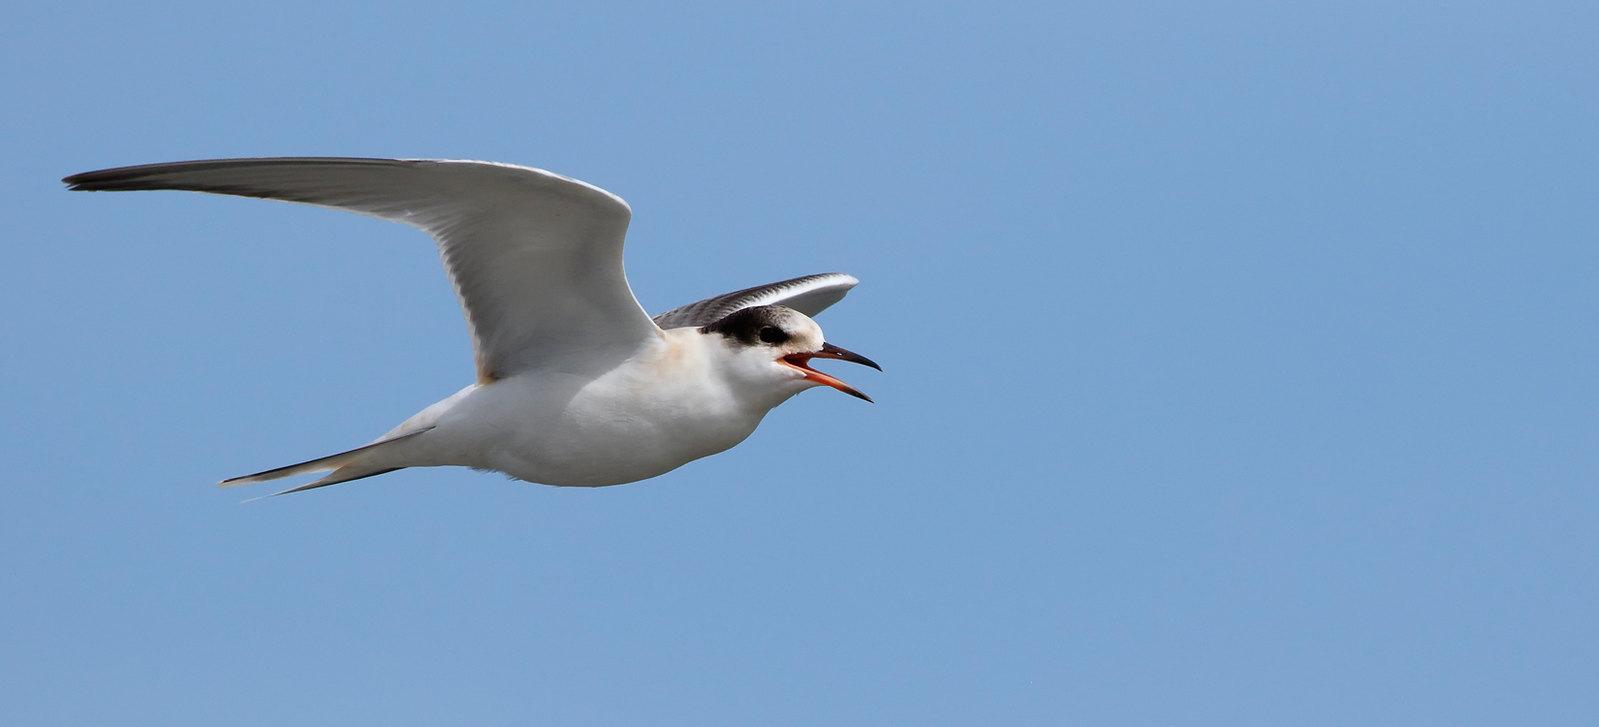 Juvenile Common Tern